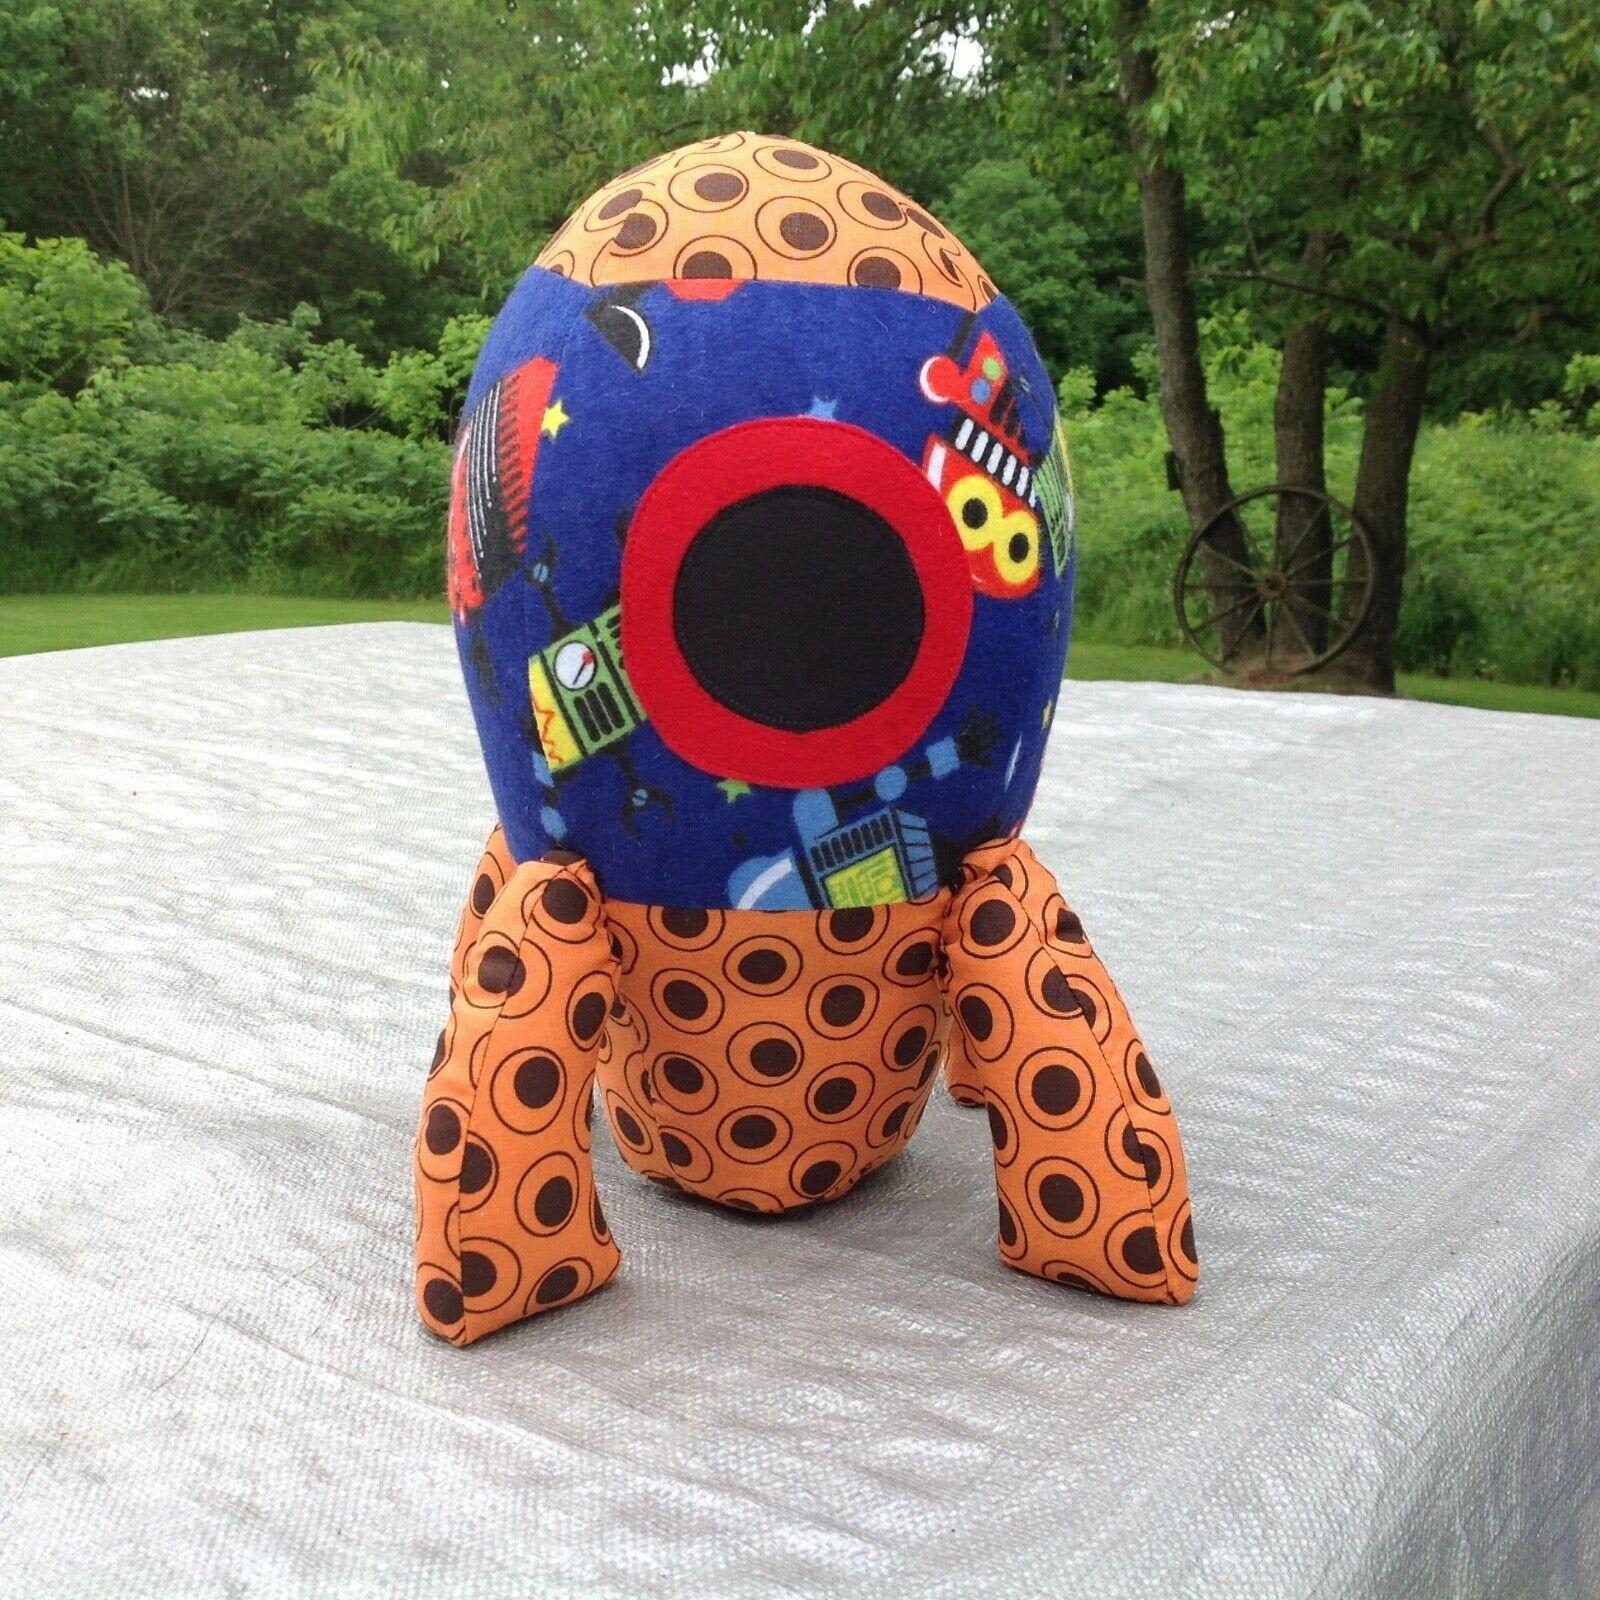 Handmade Rocket Ship Stuffed Toy Plushie Large Stuffie Etsy Pig Stuffed Toy Hanging Quilts Handmade